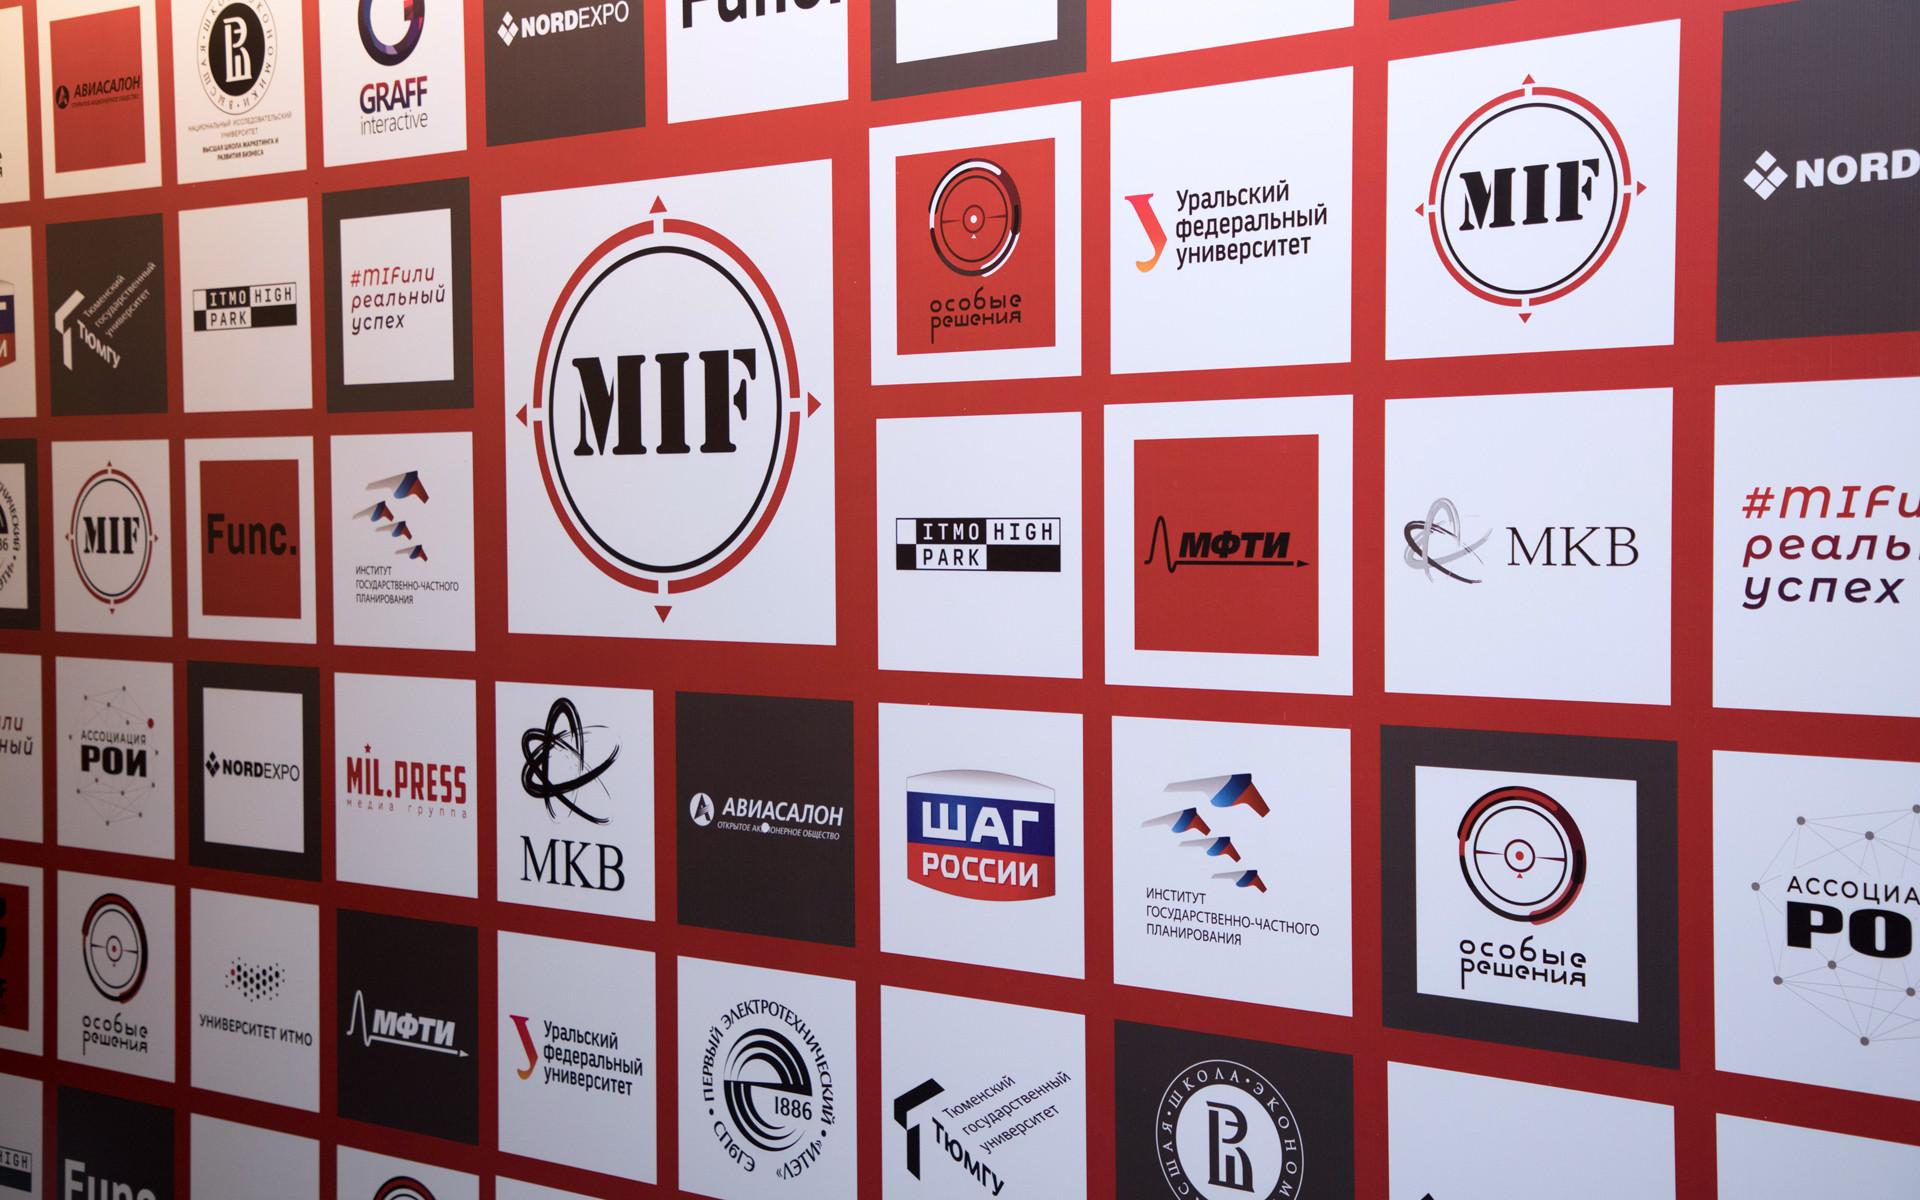 Форум MIF в Сочи